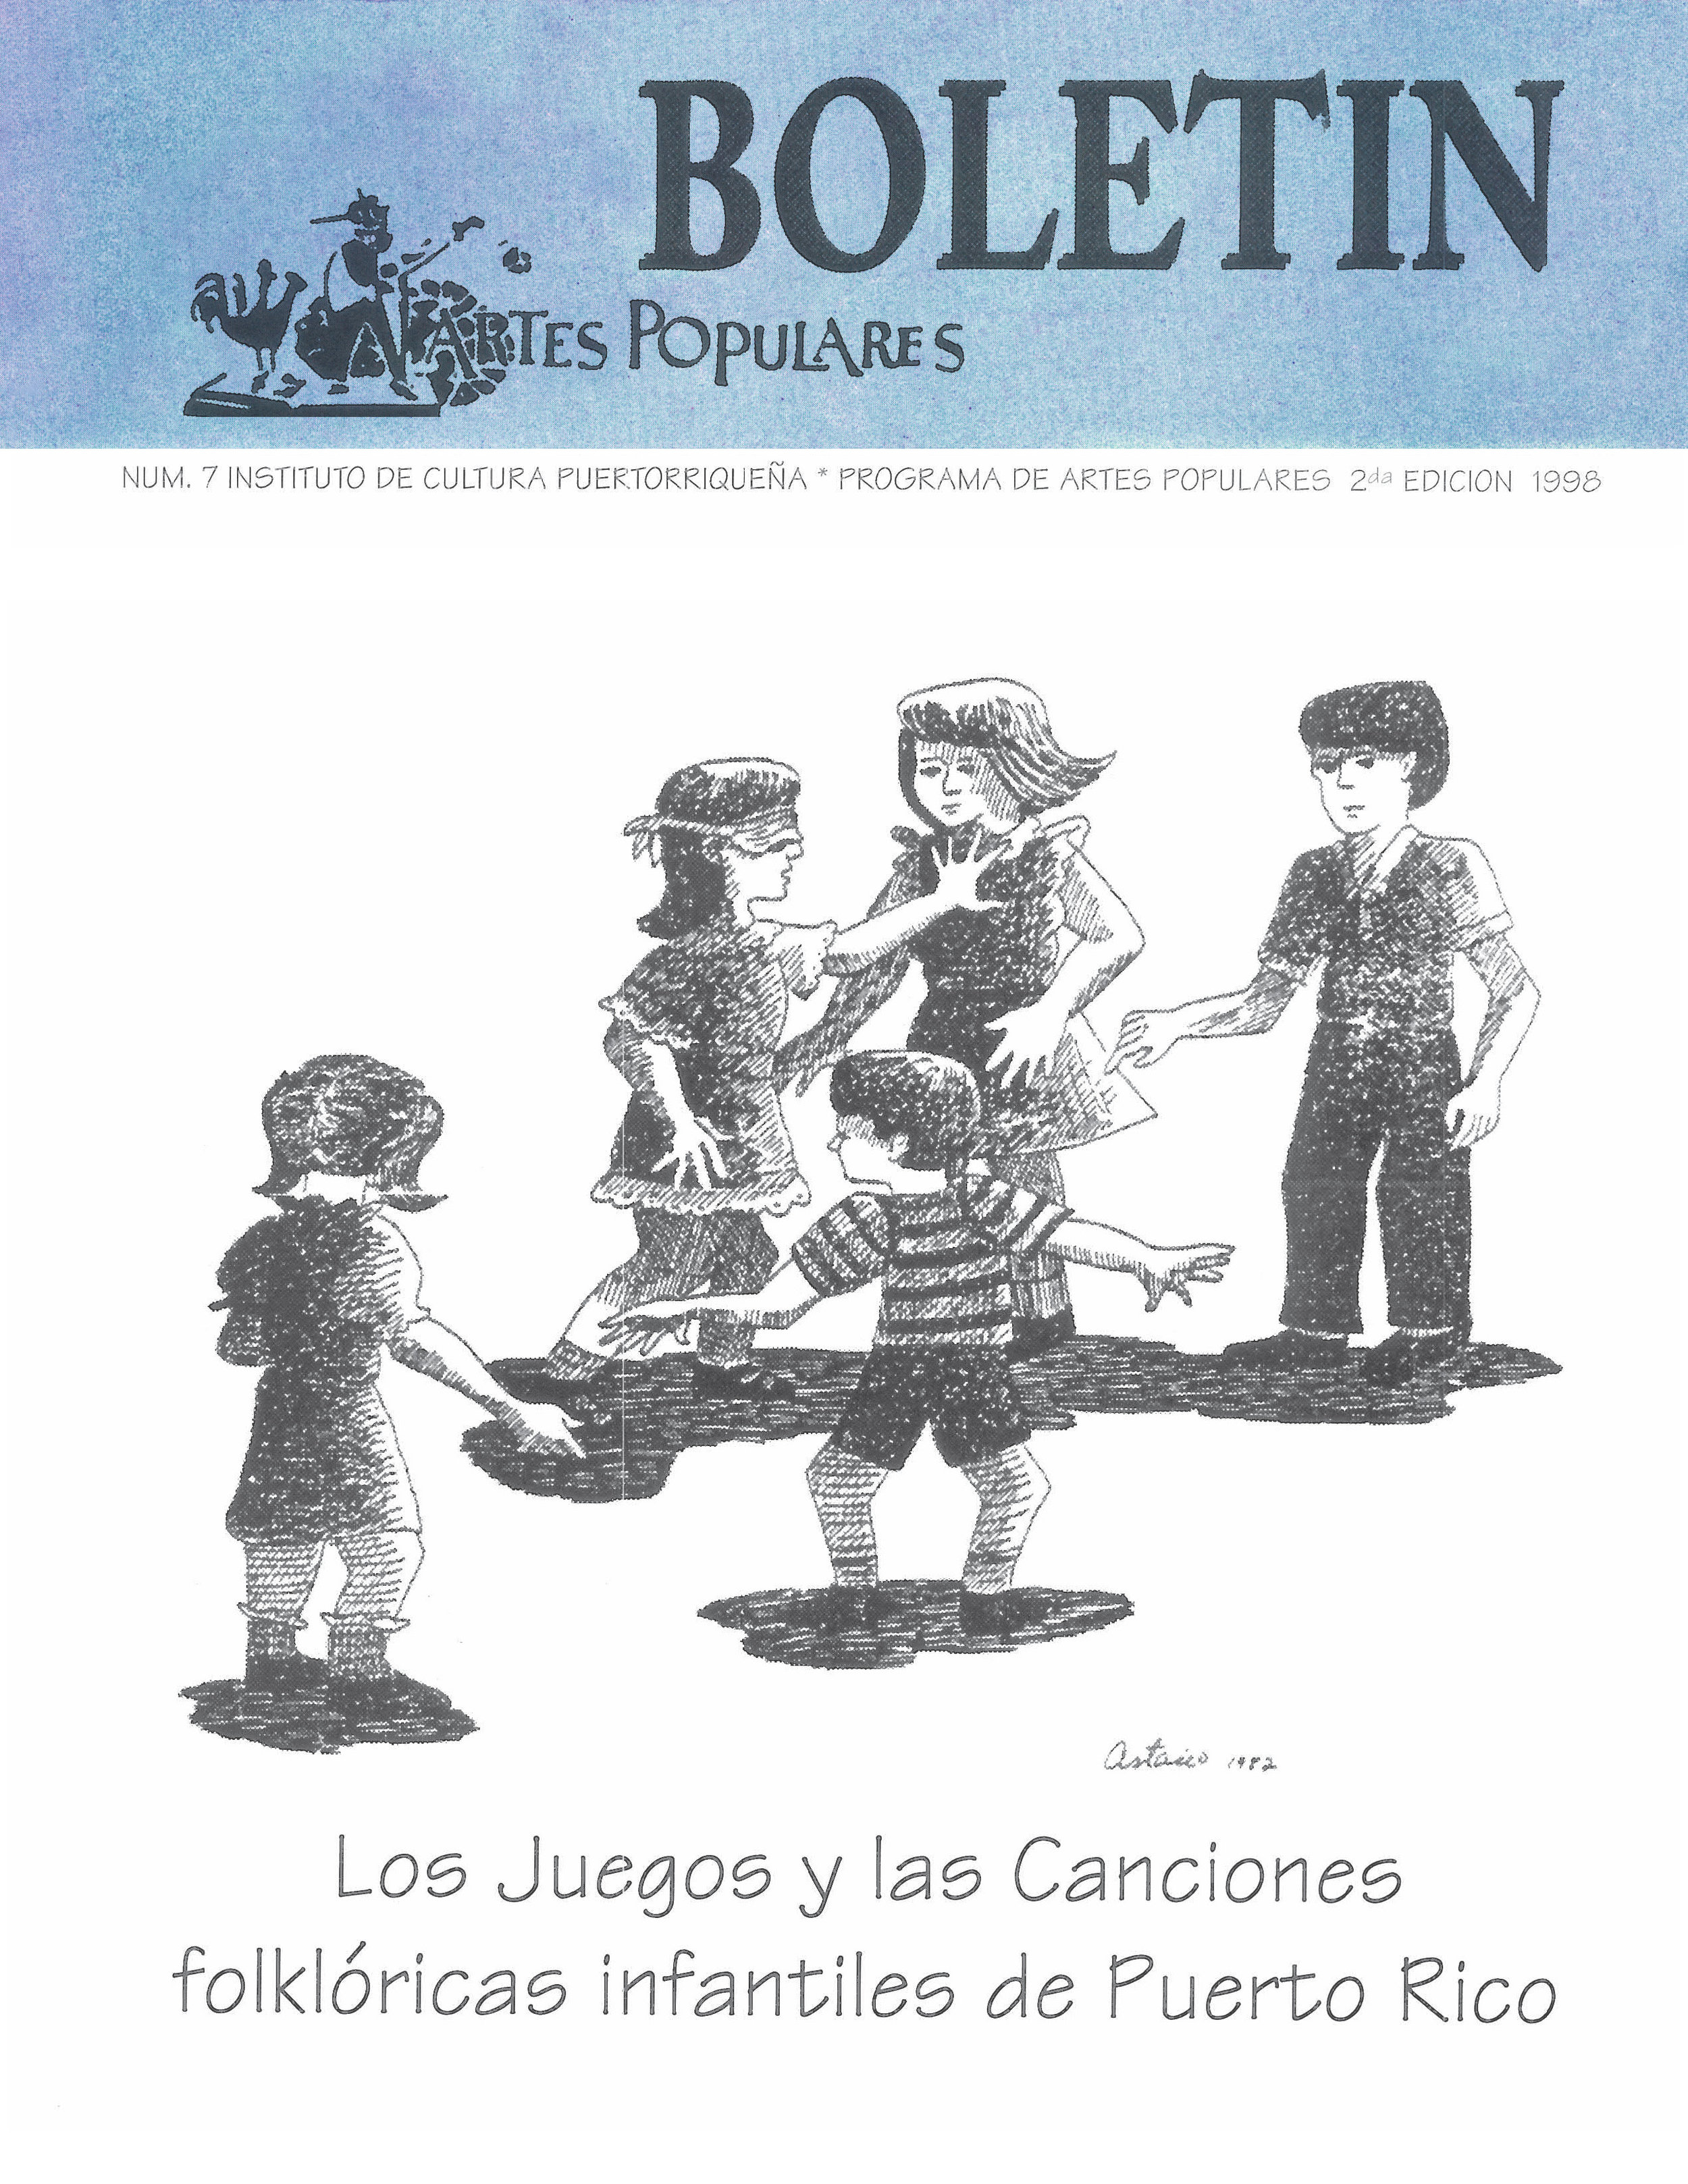 Boletín de Artes Populares #7.jpg